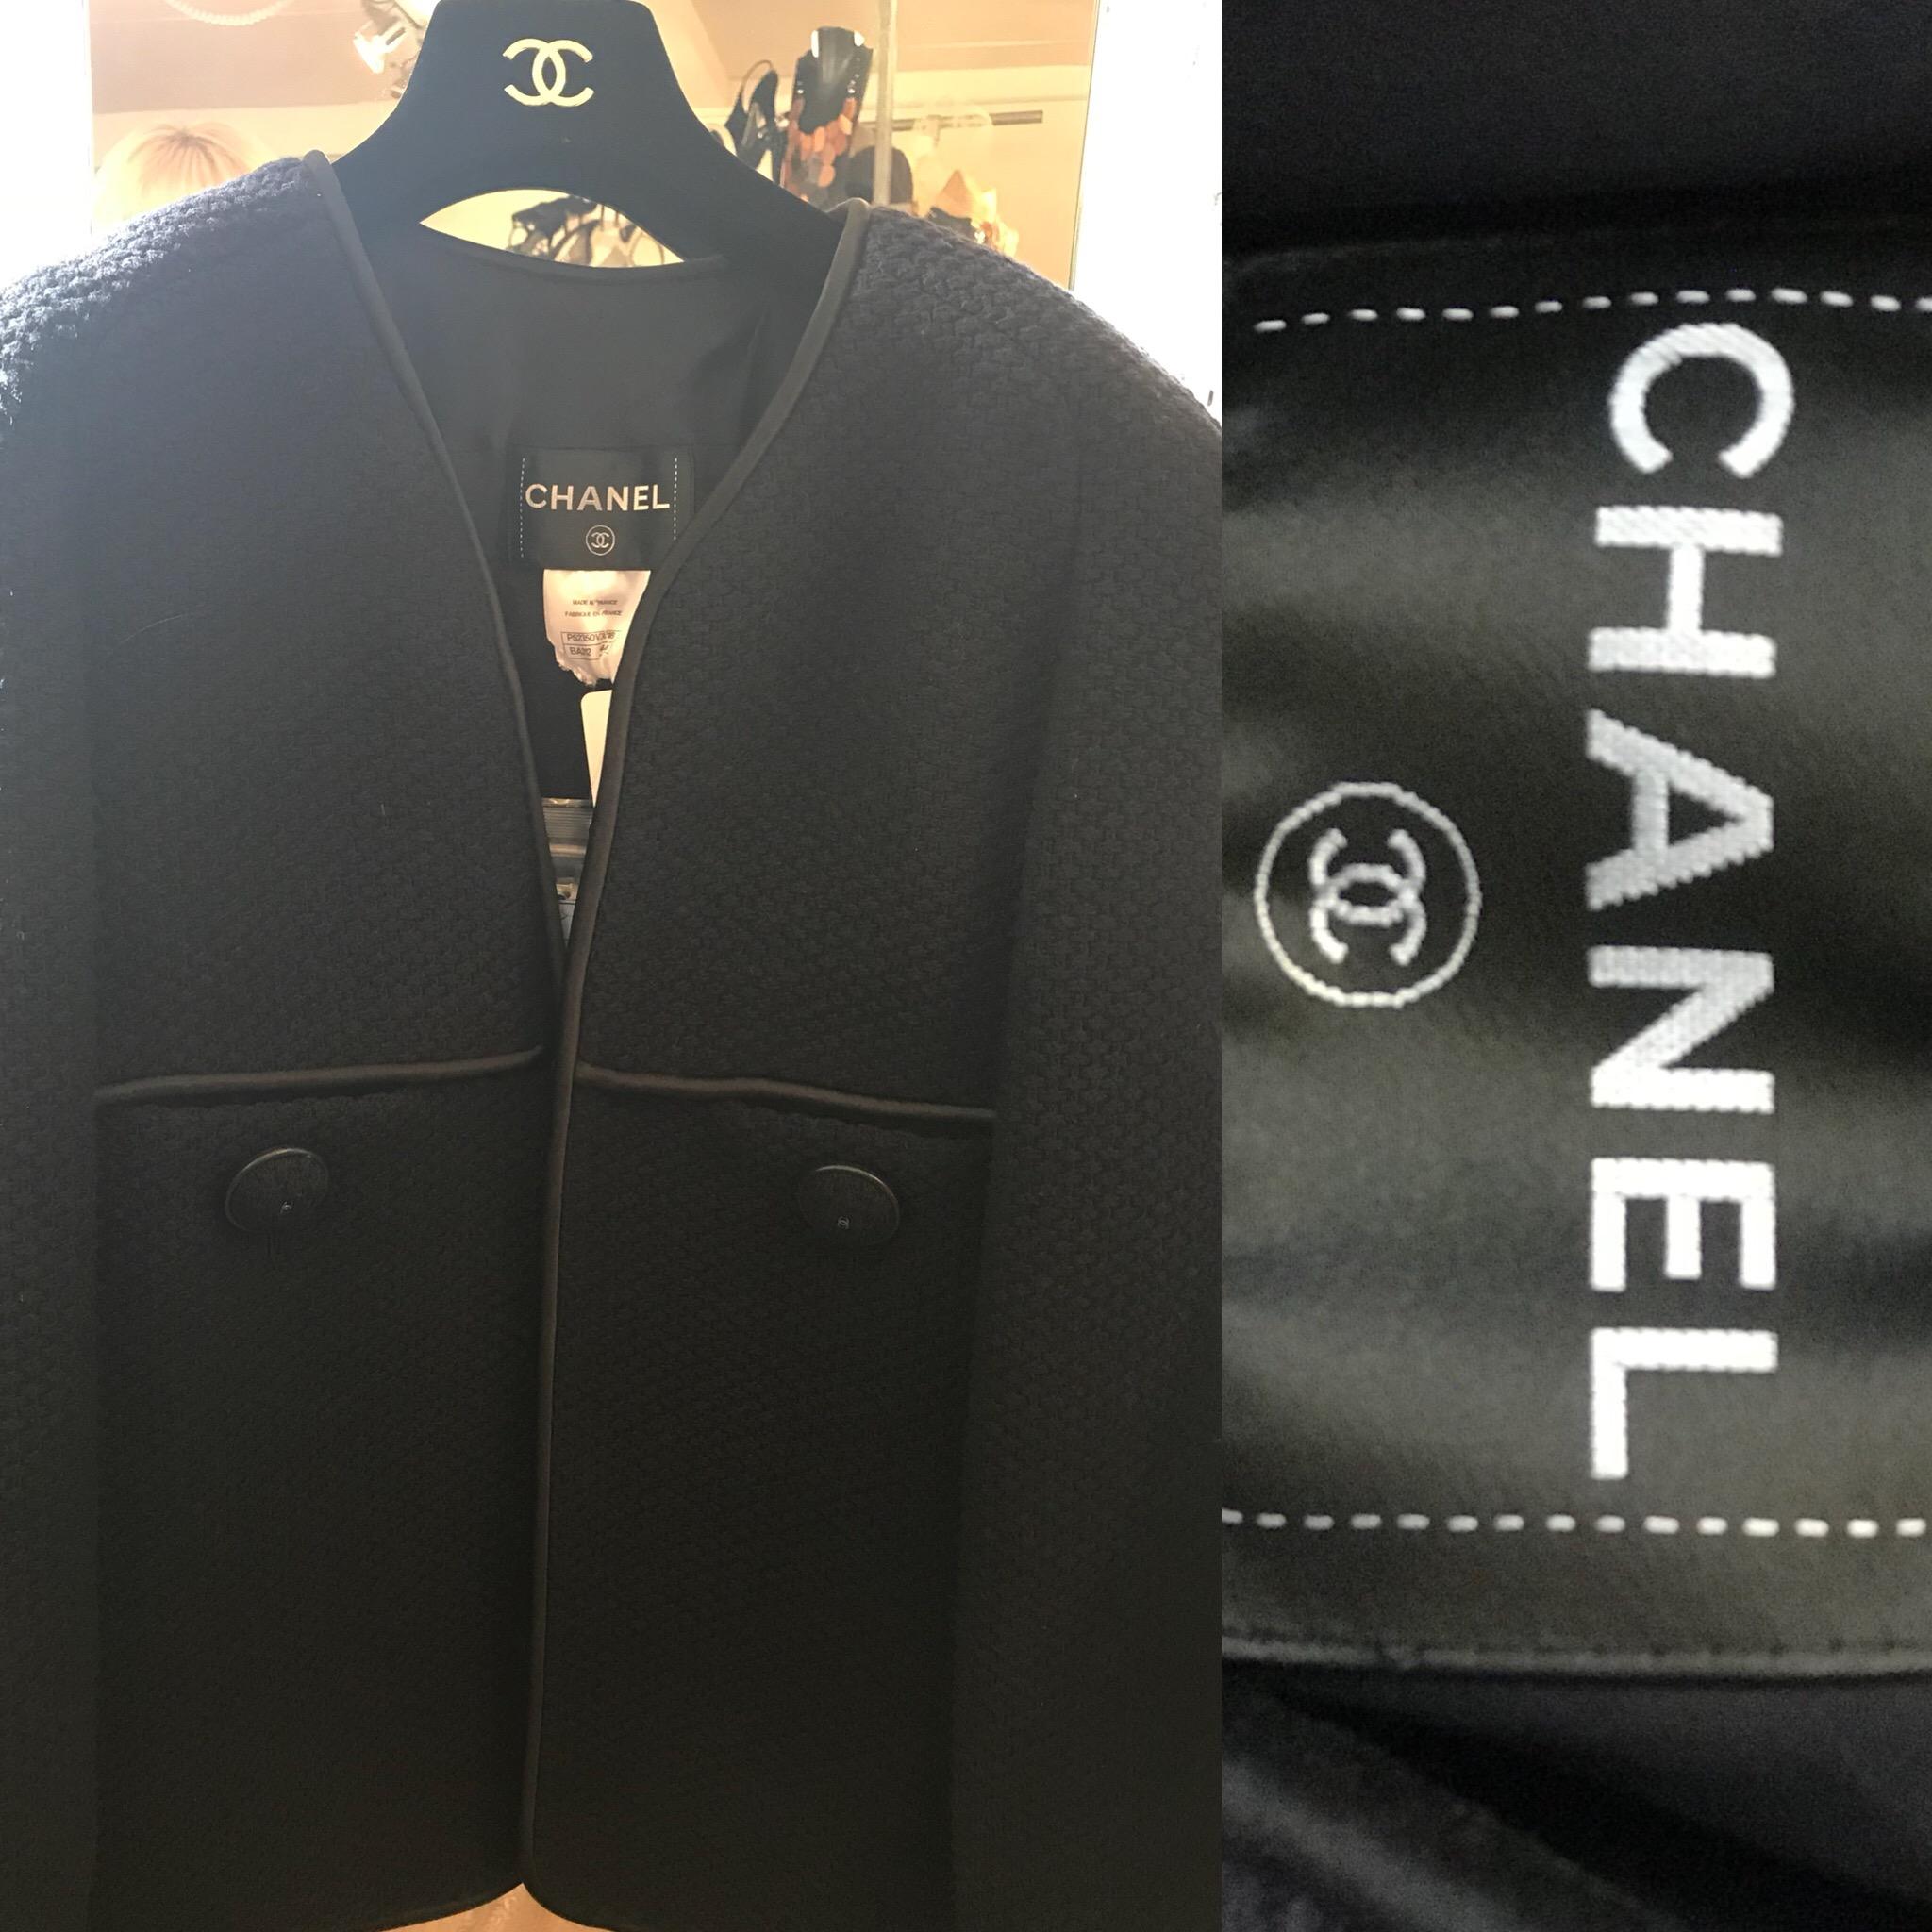 Chanel jacket in Navy size 44 £499.JPG